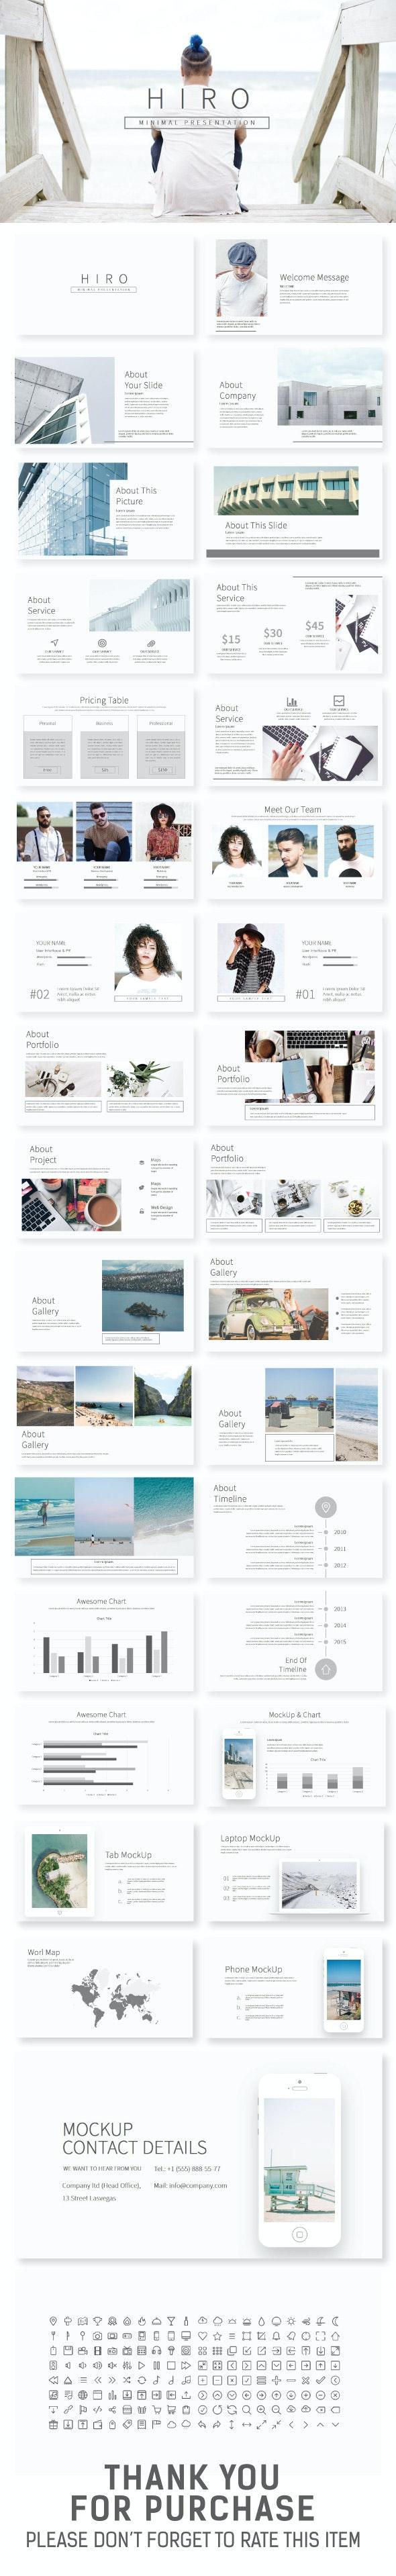 HIRO Minimal Presentation - Creative PowerPoint Templates